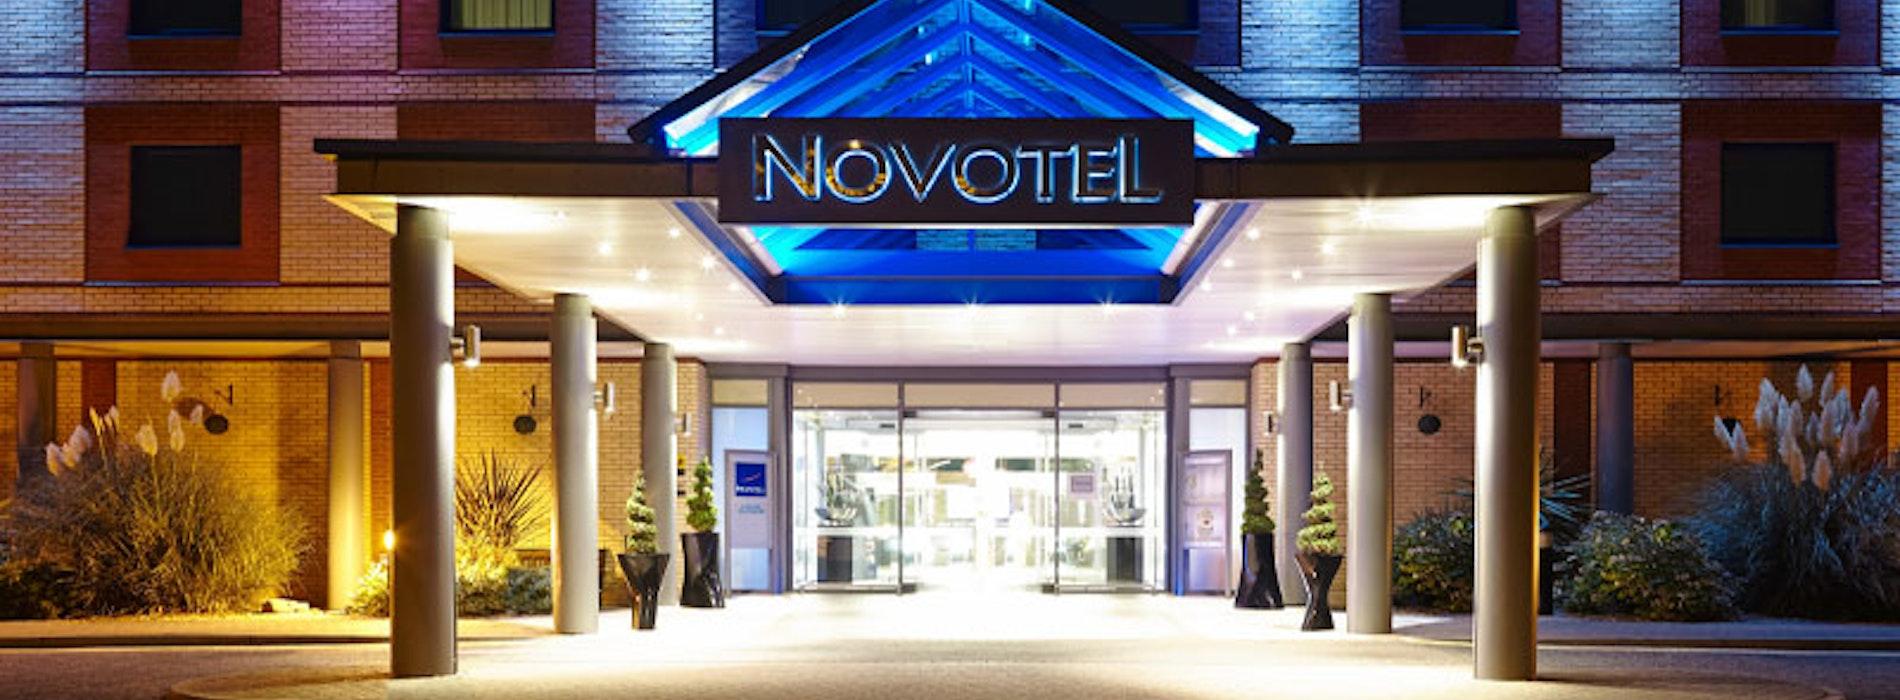 Novotel Heathrow near LEGOLAND Windsor Resort